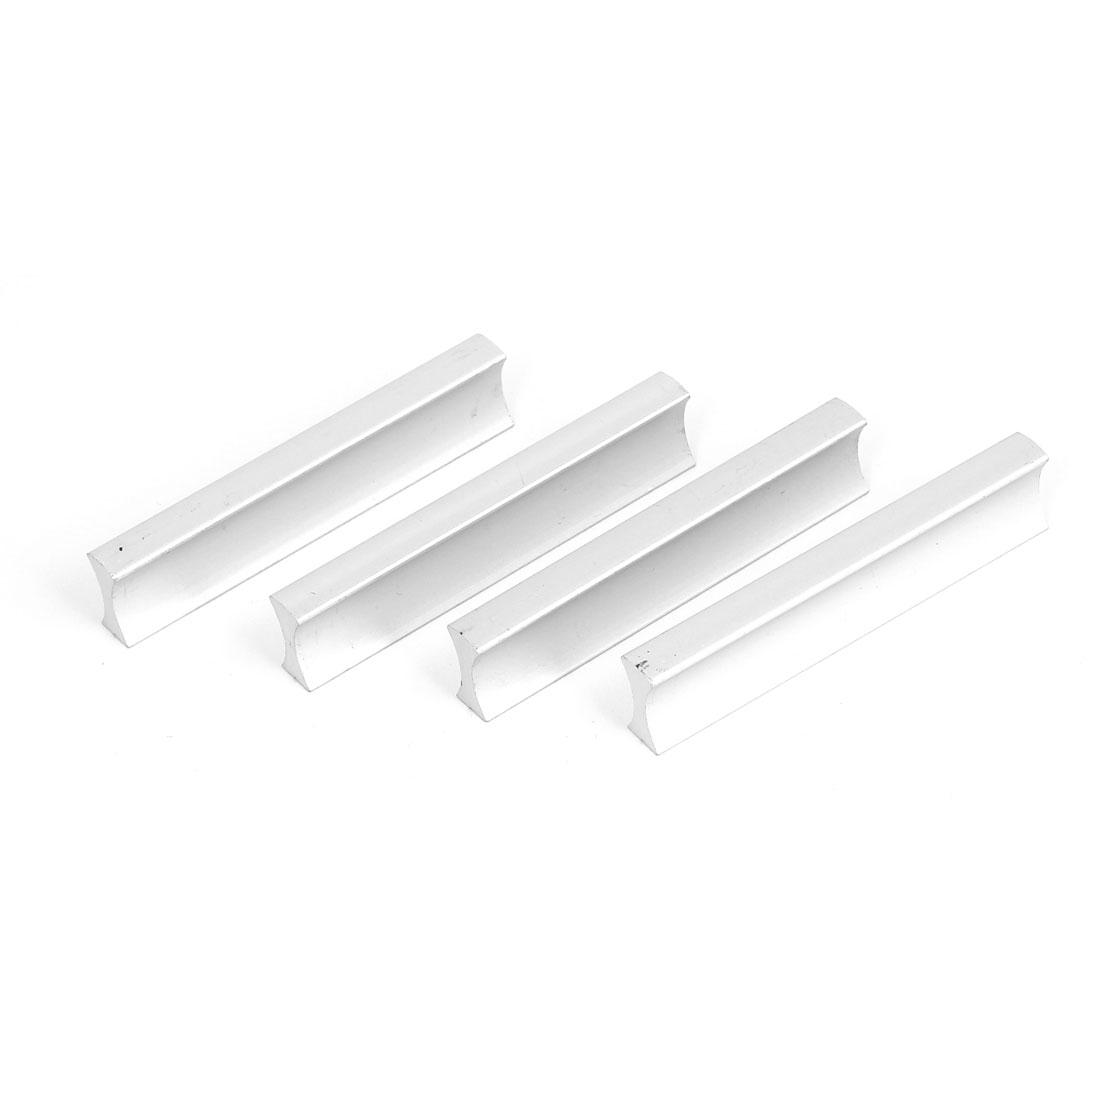 Cabinet Drawer Dresser Cupboard Aluminium Handlebar Pull Handle Silver Tone 4pcs